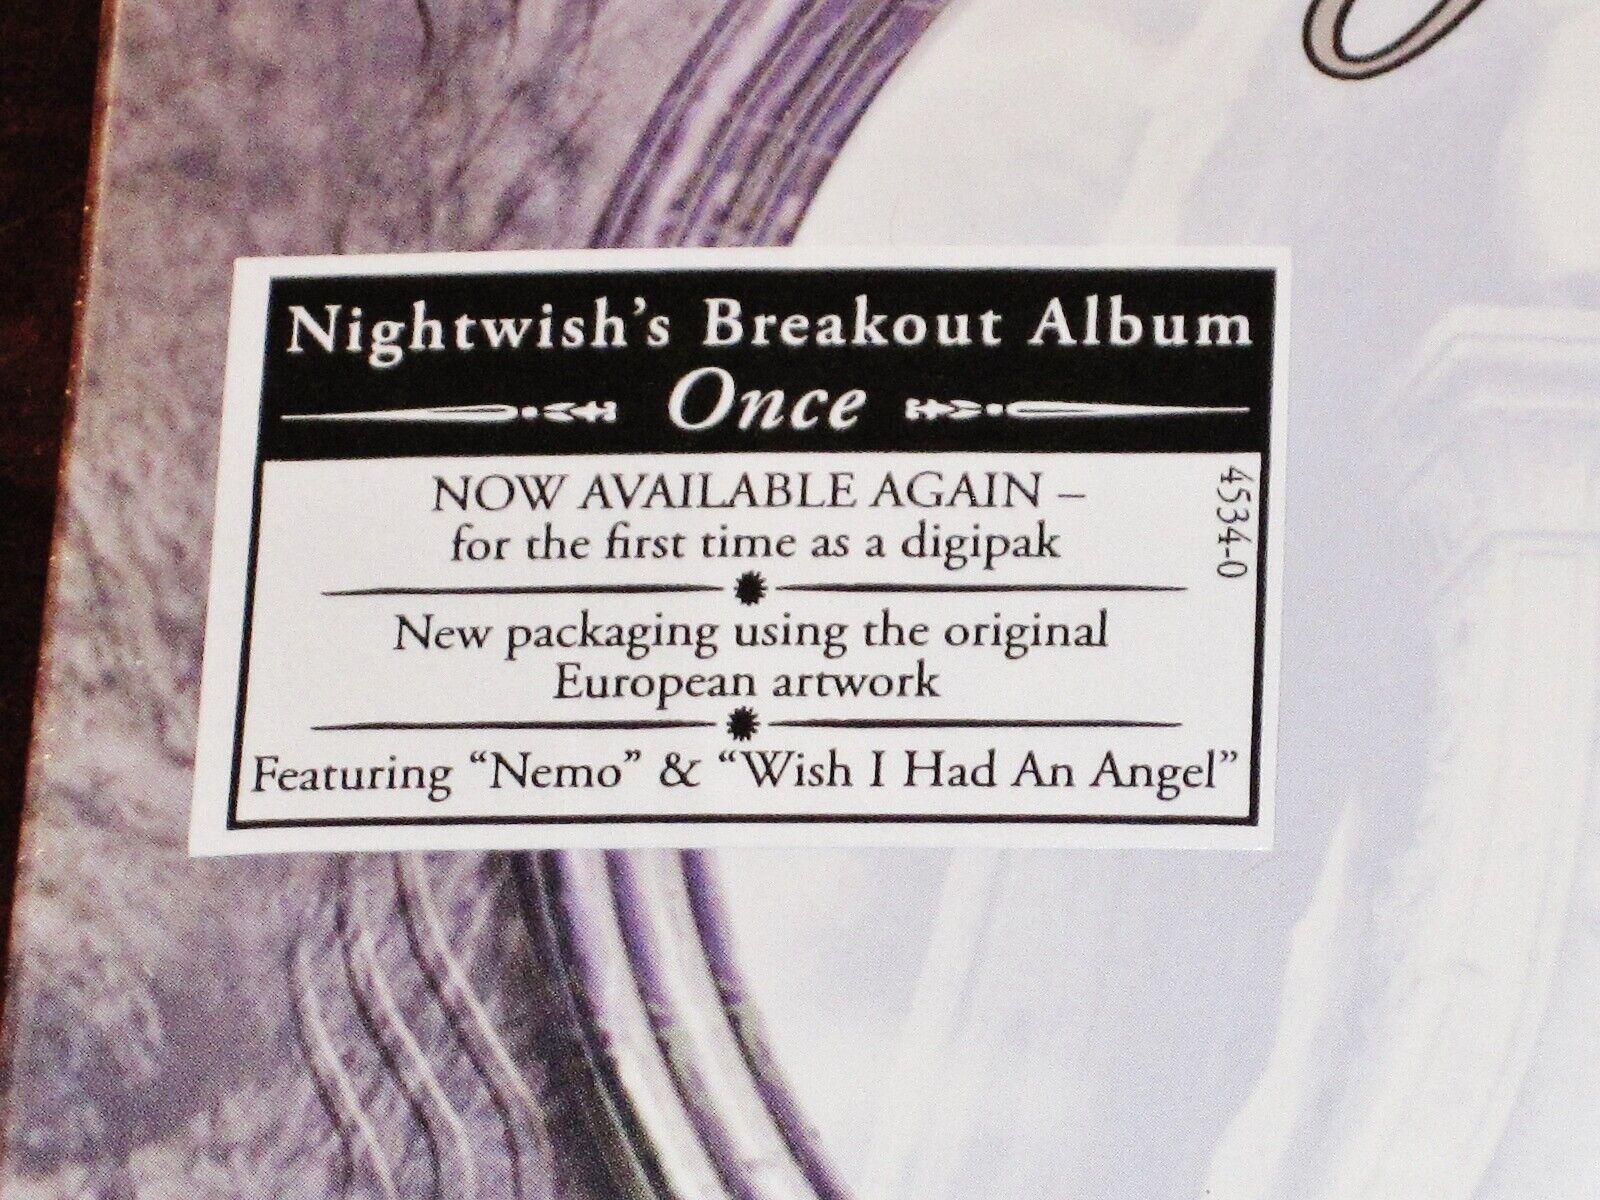 NIGHTWISH GRATIS GRATUITO DOWNLOAD ONCE CD